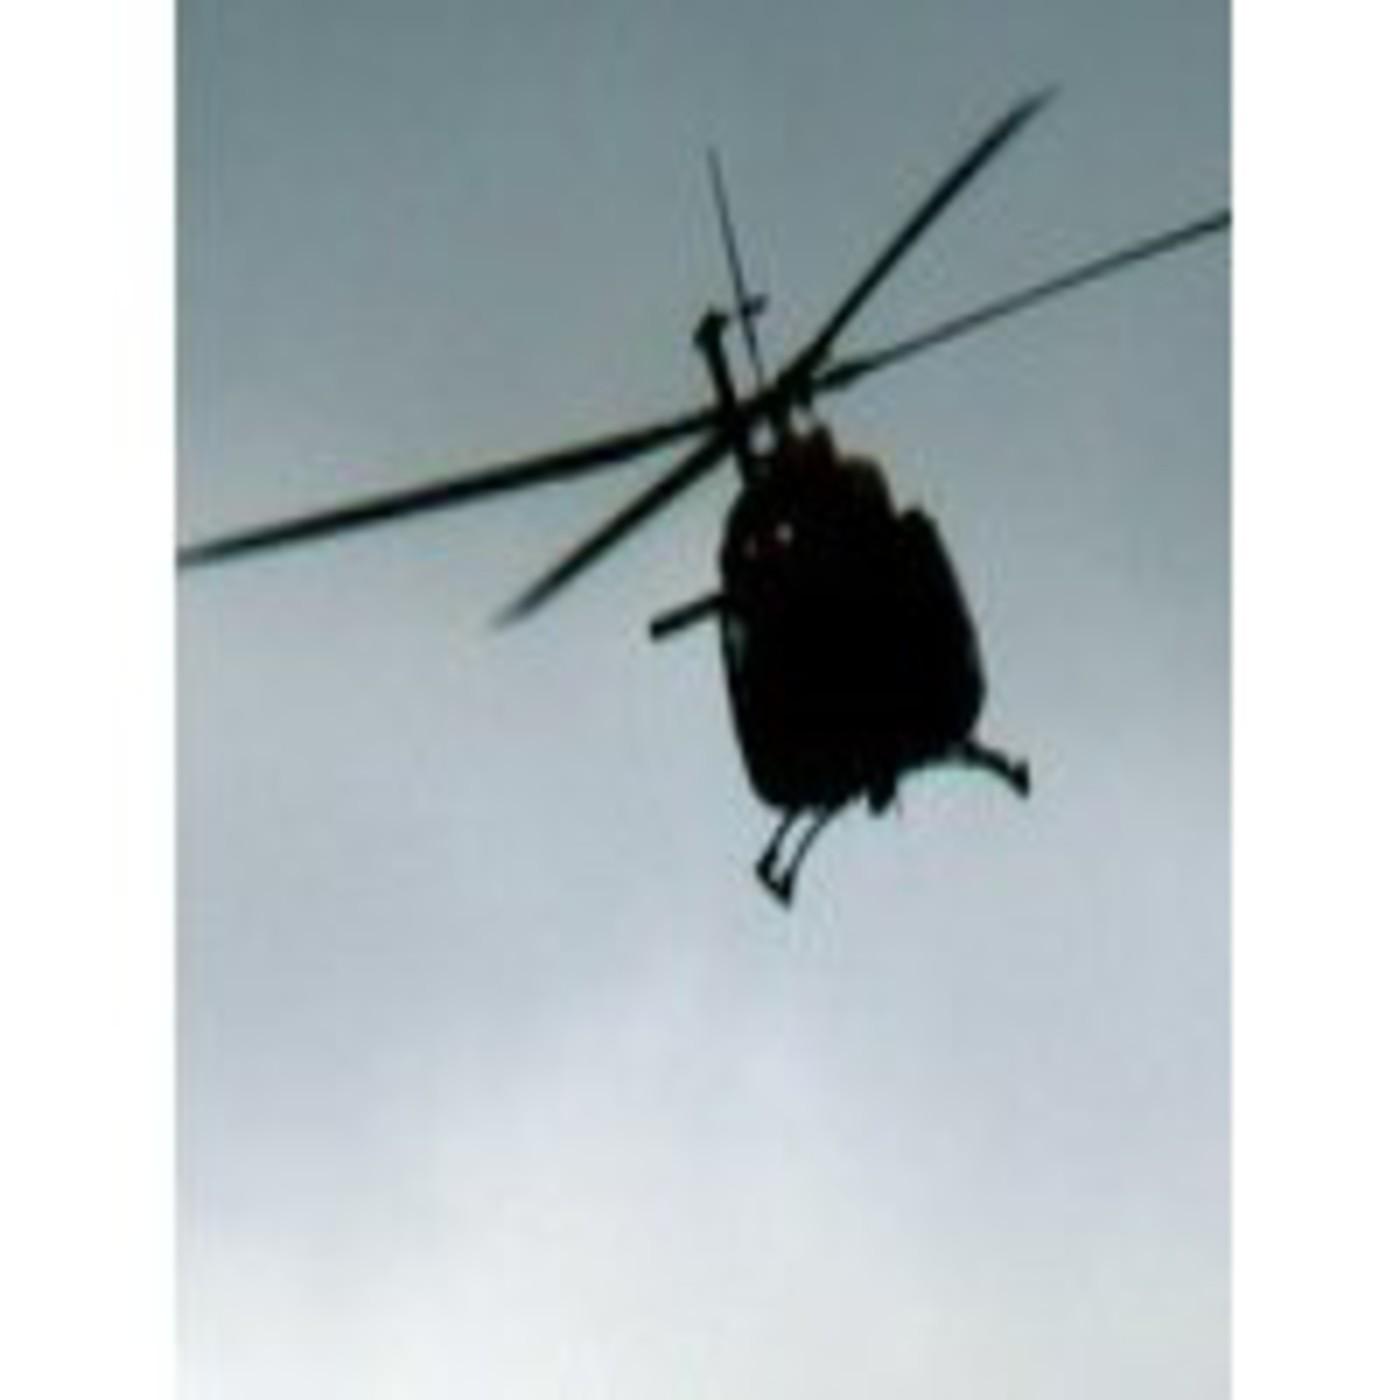 171 - Helicópteros Negros